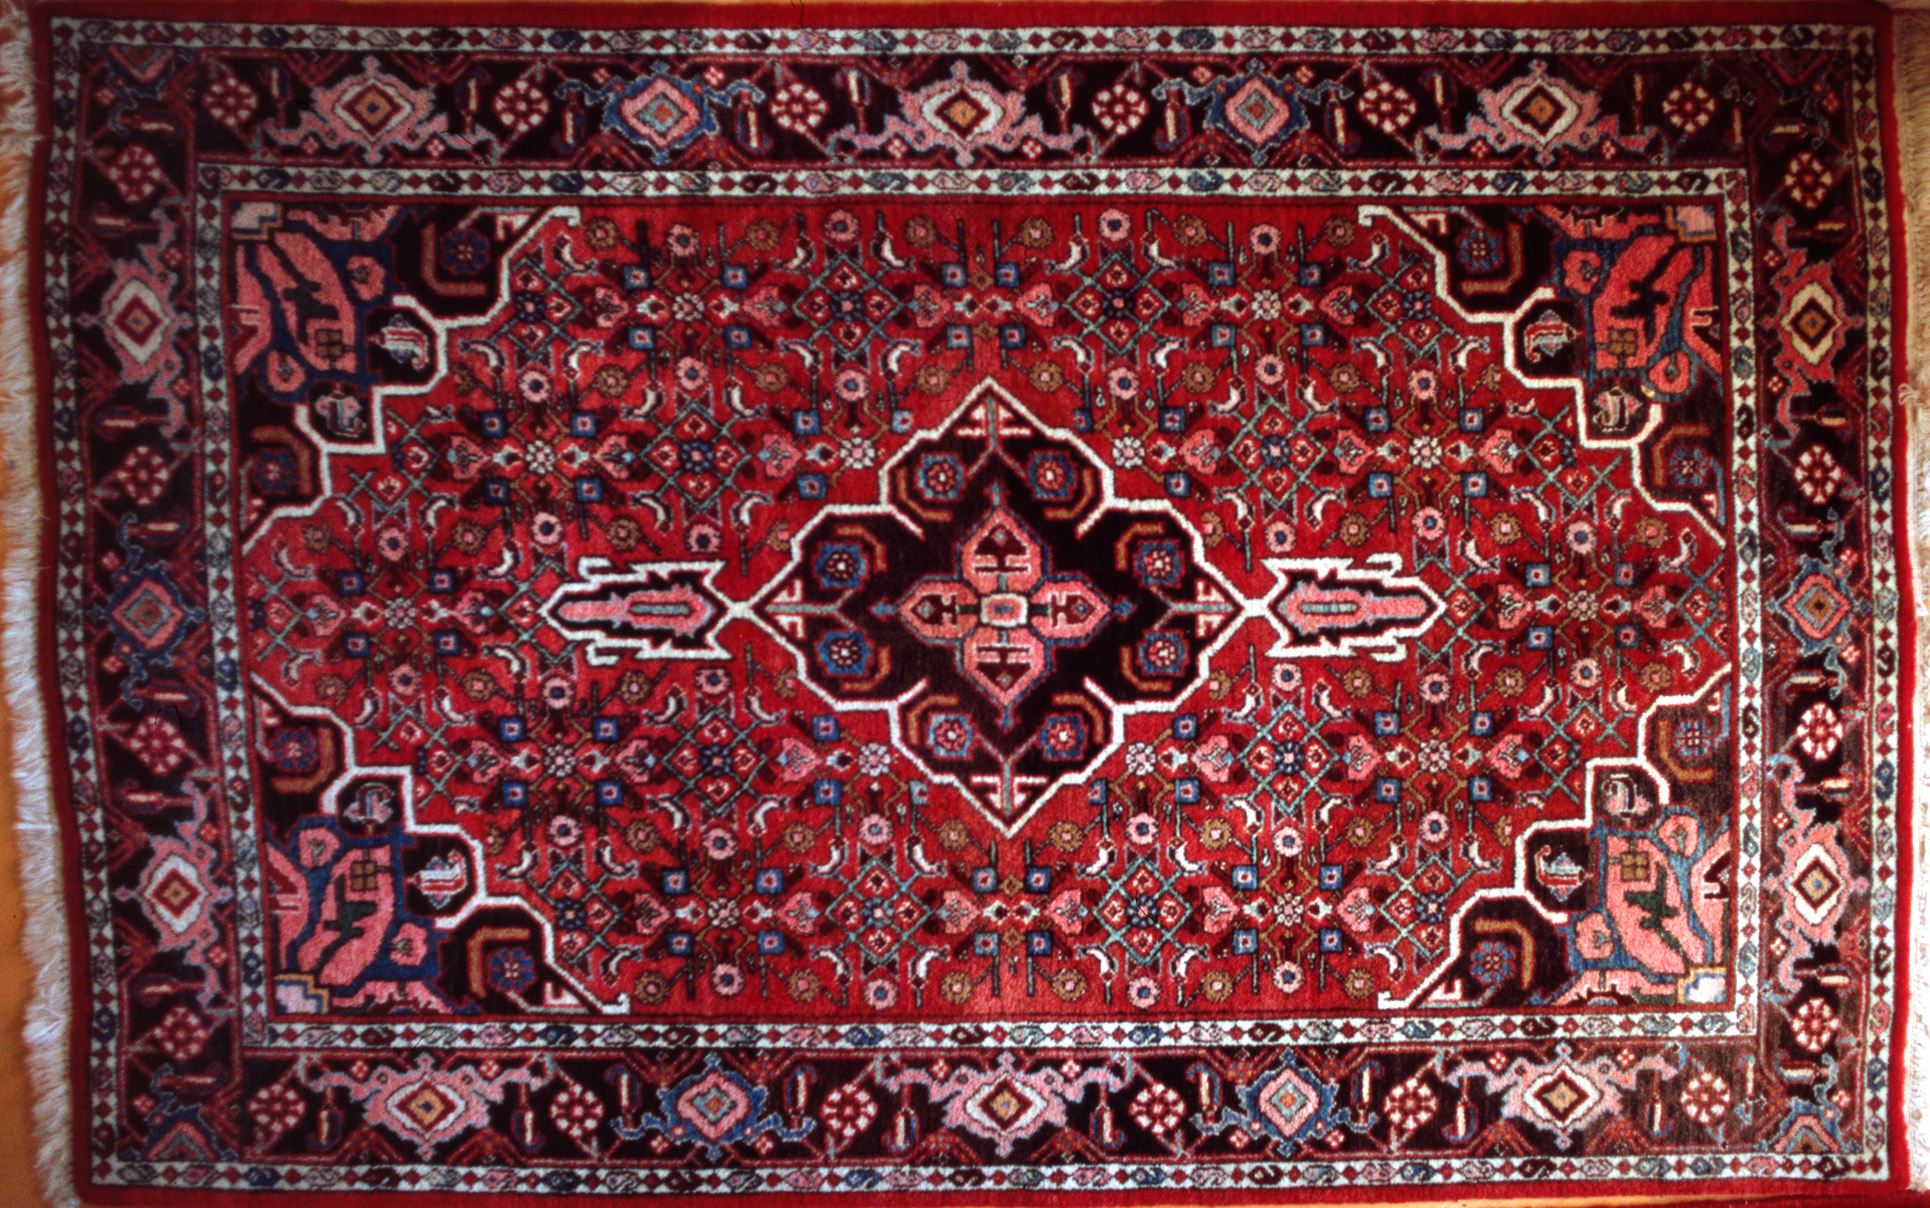 Russian Rugs On Walls Aka Russian Carpets Interesting